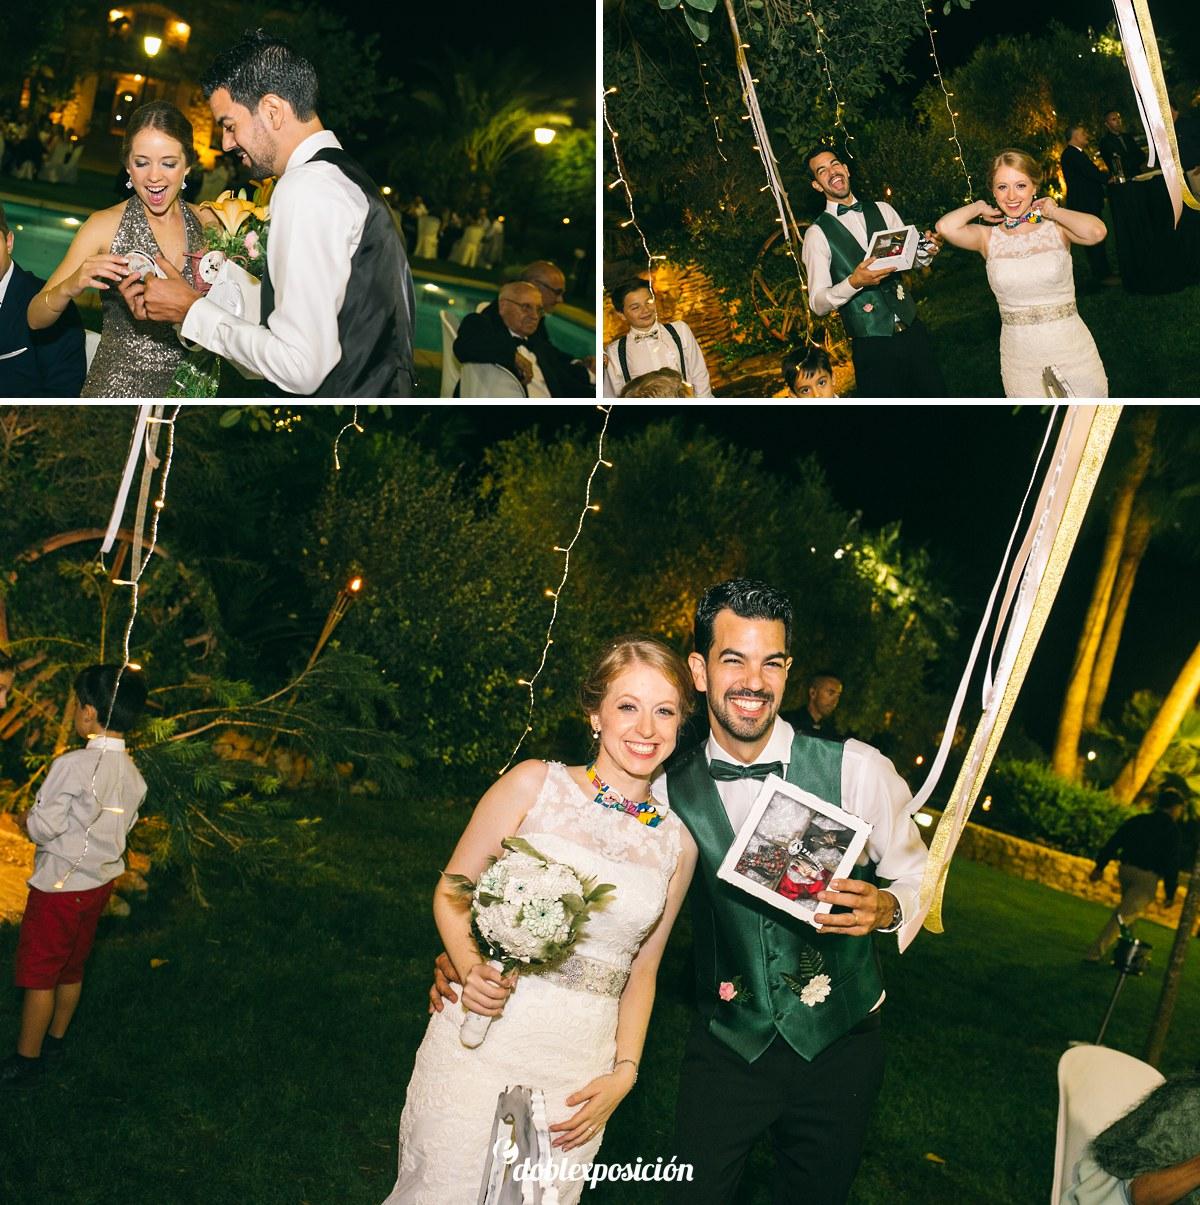 fotografos-boda-campo-masia-finca-el-lago-elche-alicante_0050